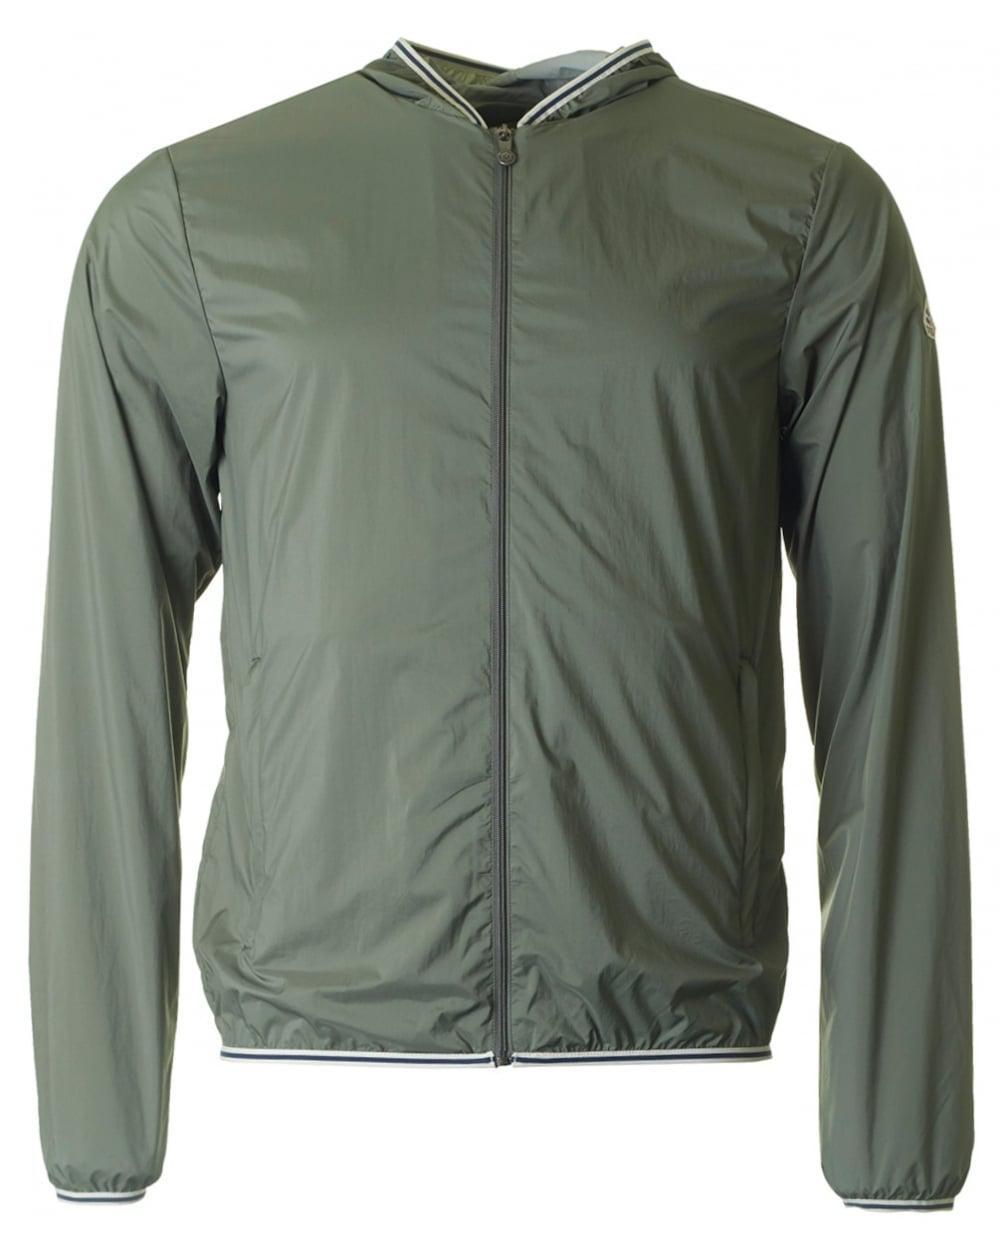 228ad726a Pyrenex Hendricks Light Jacket in Green for Men - Lyst